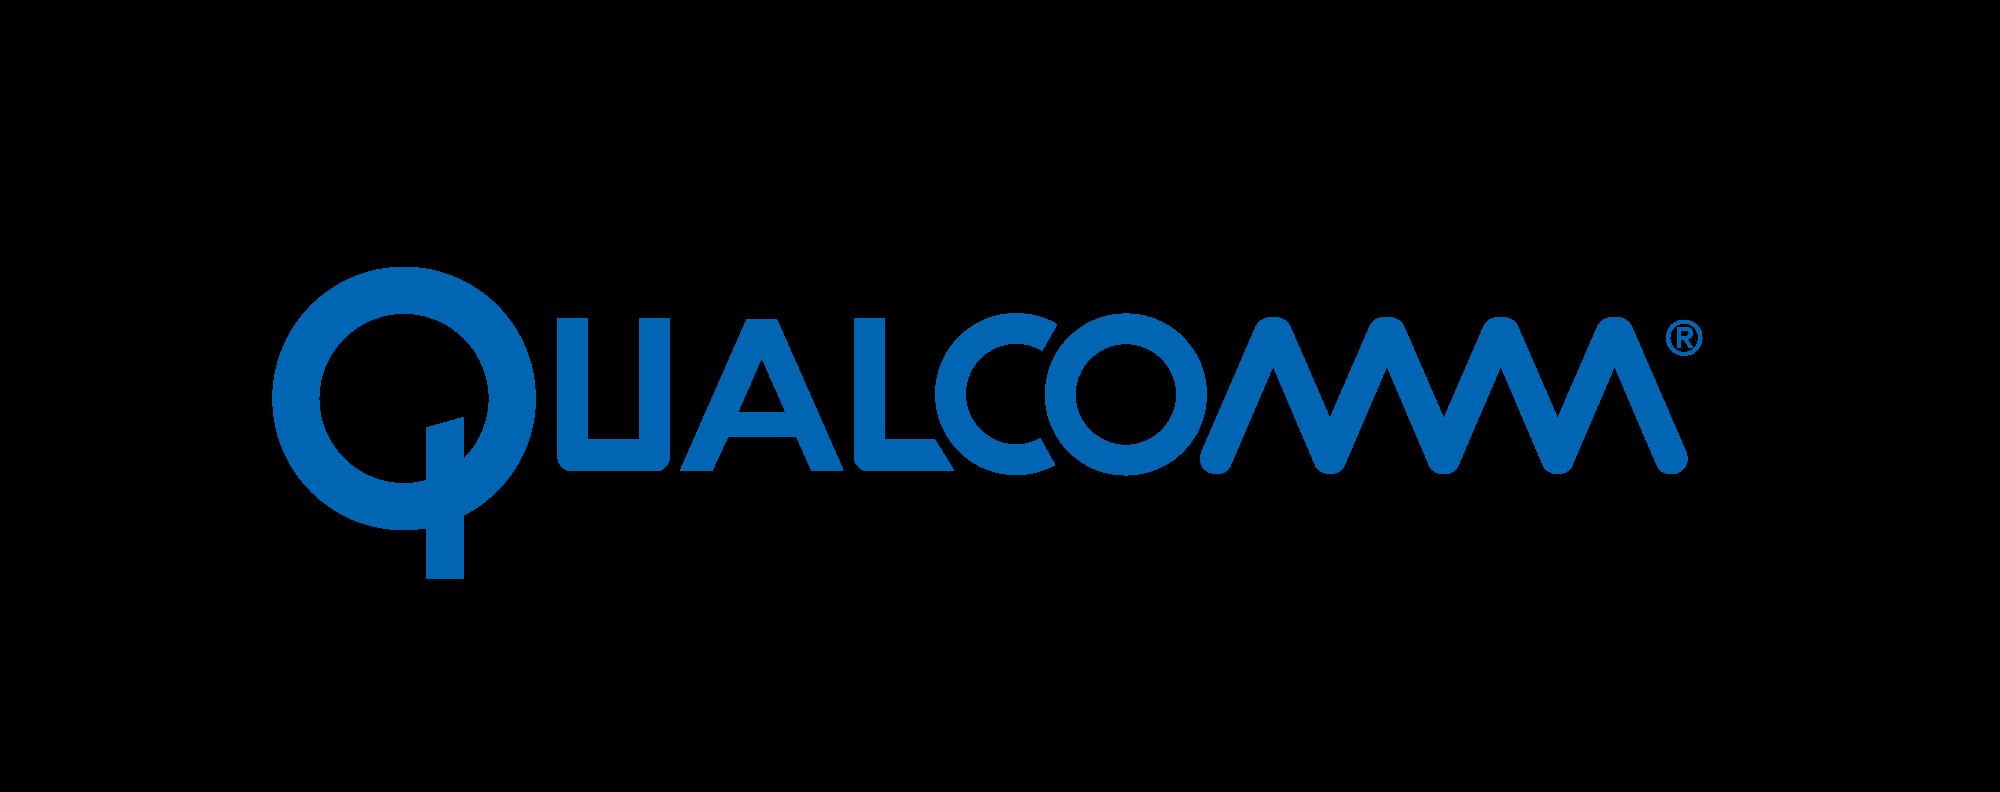 Qualcomm Logo - OpenChain  Qualcomm Logo -...